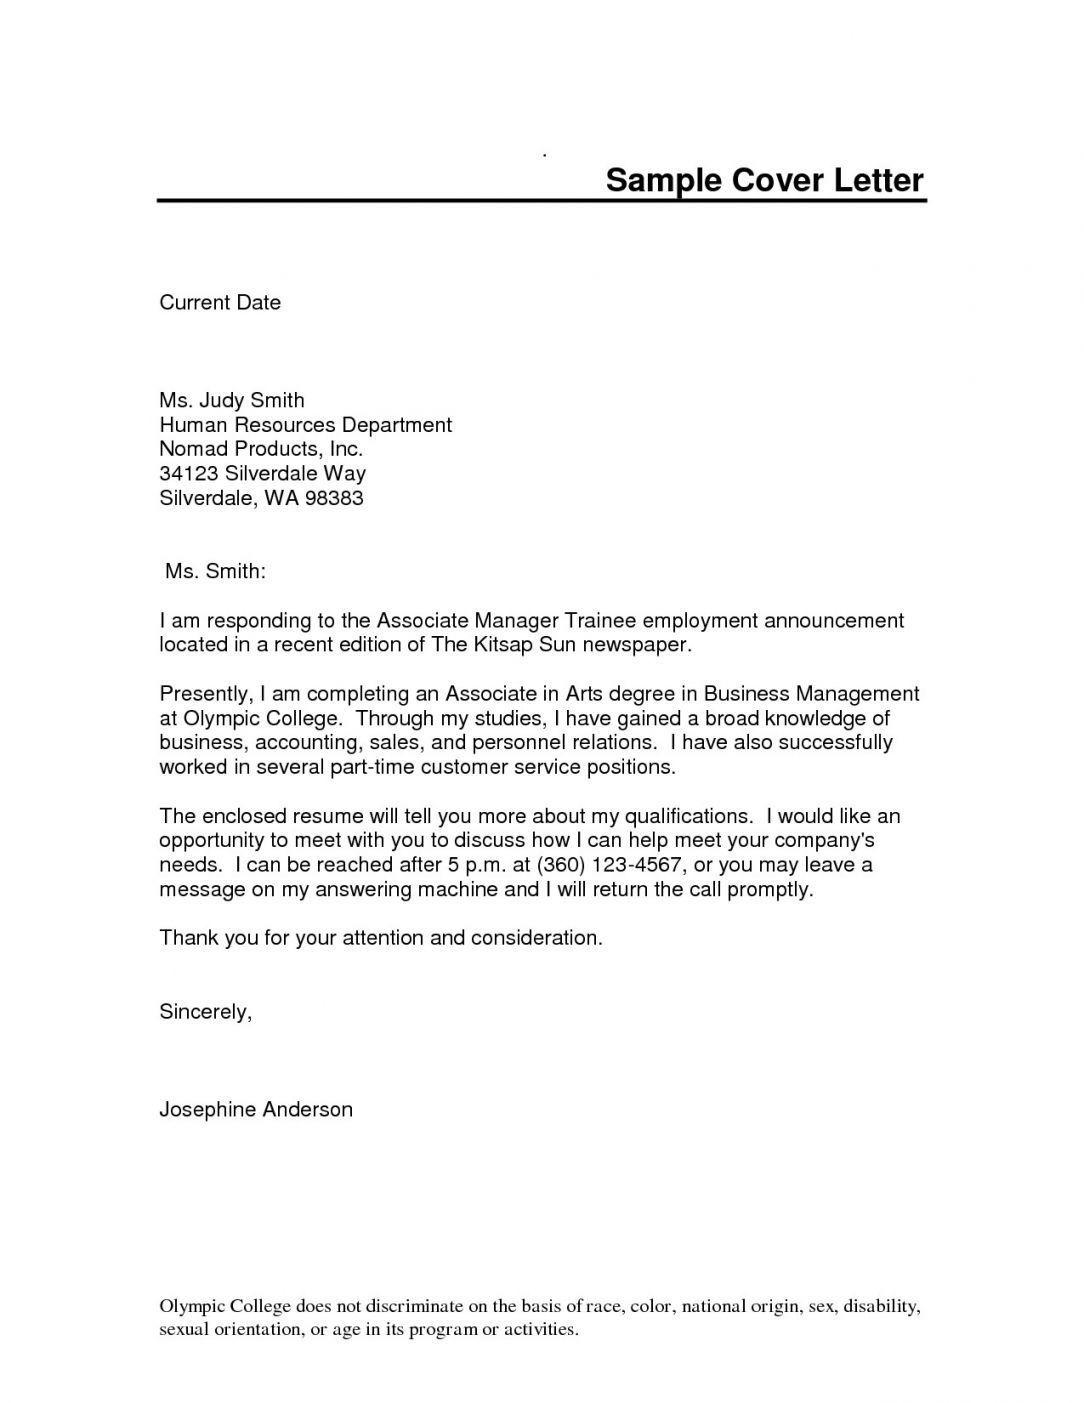 000 Fascinating Letter Template Microsoft Word Design  Naval Format 2010 2007Full